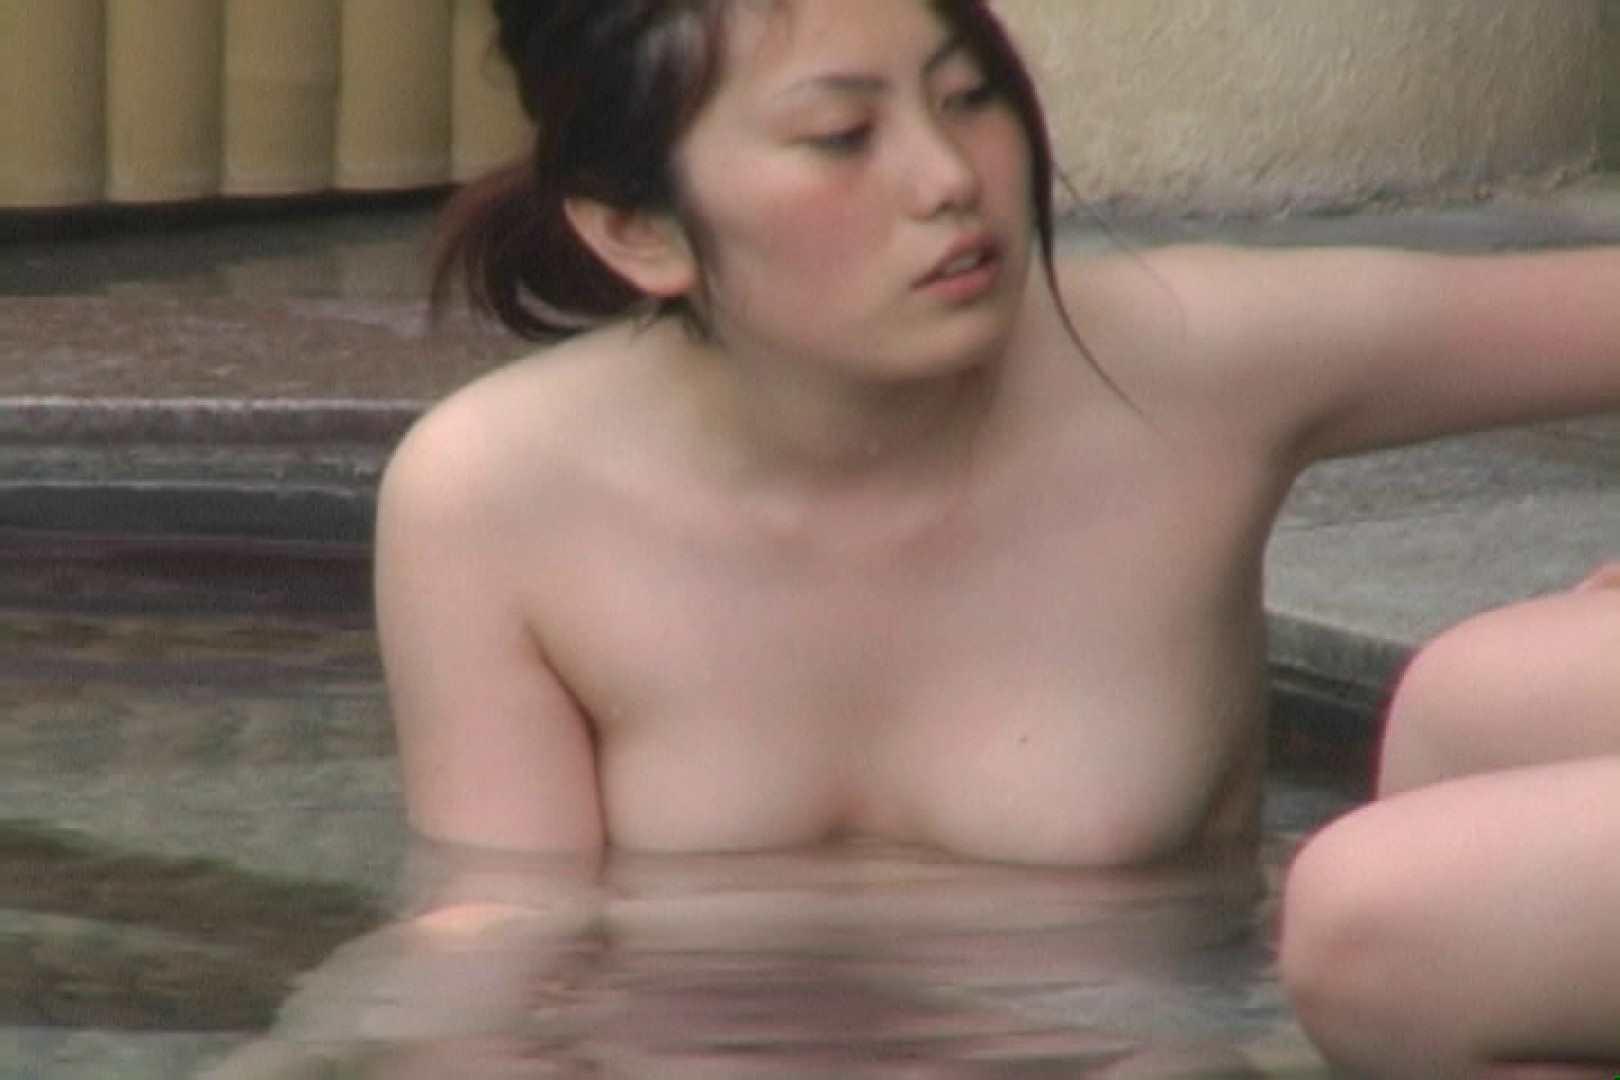 Aquaな露天風呂Vol.29【VIP】 OLセックス 盗撮セックス無修正動画無料 49画像 47